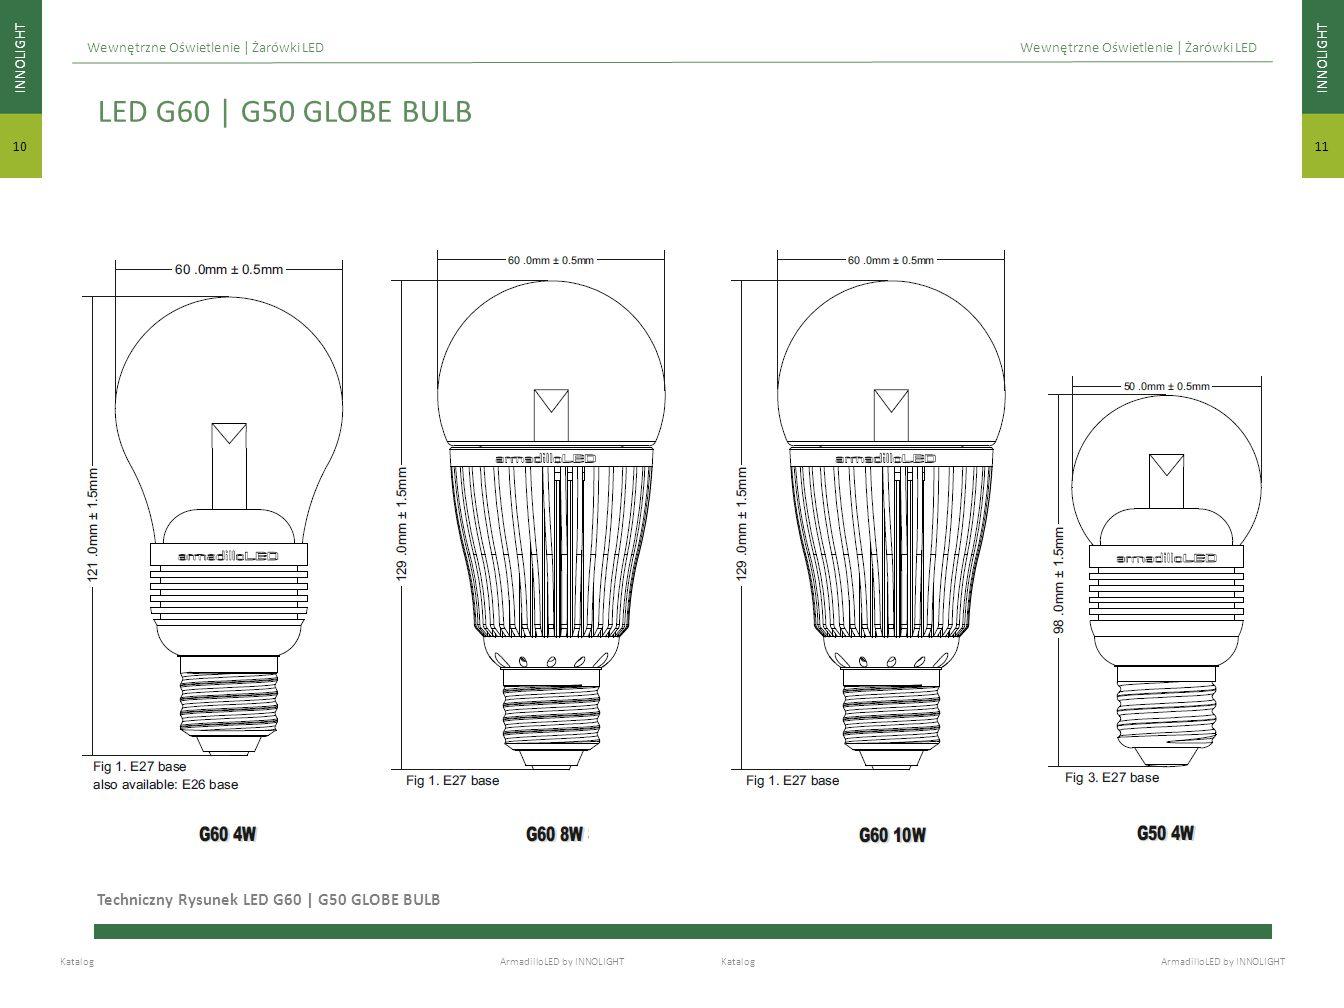 LED G60 | G50 GLOBE BULB Techniczny Rysunek LED G60 | G50 GLOBE BULB